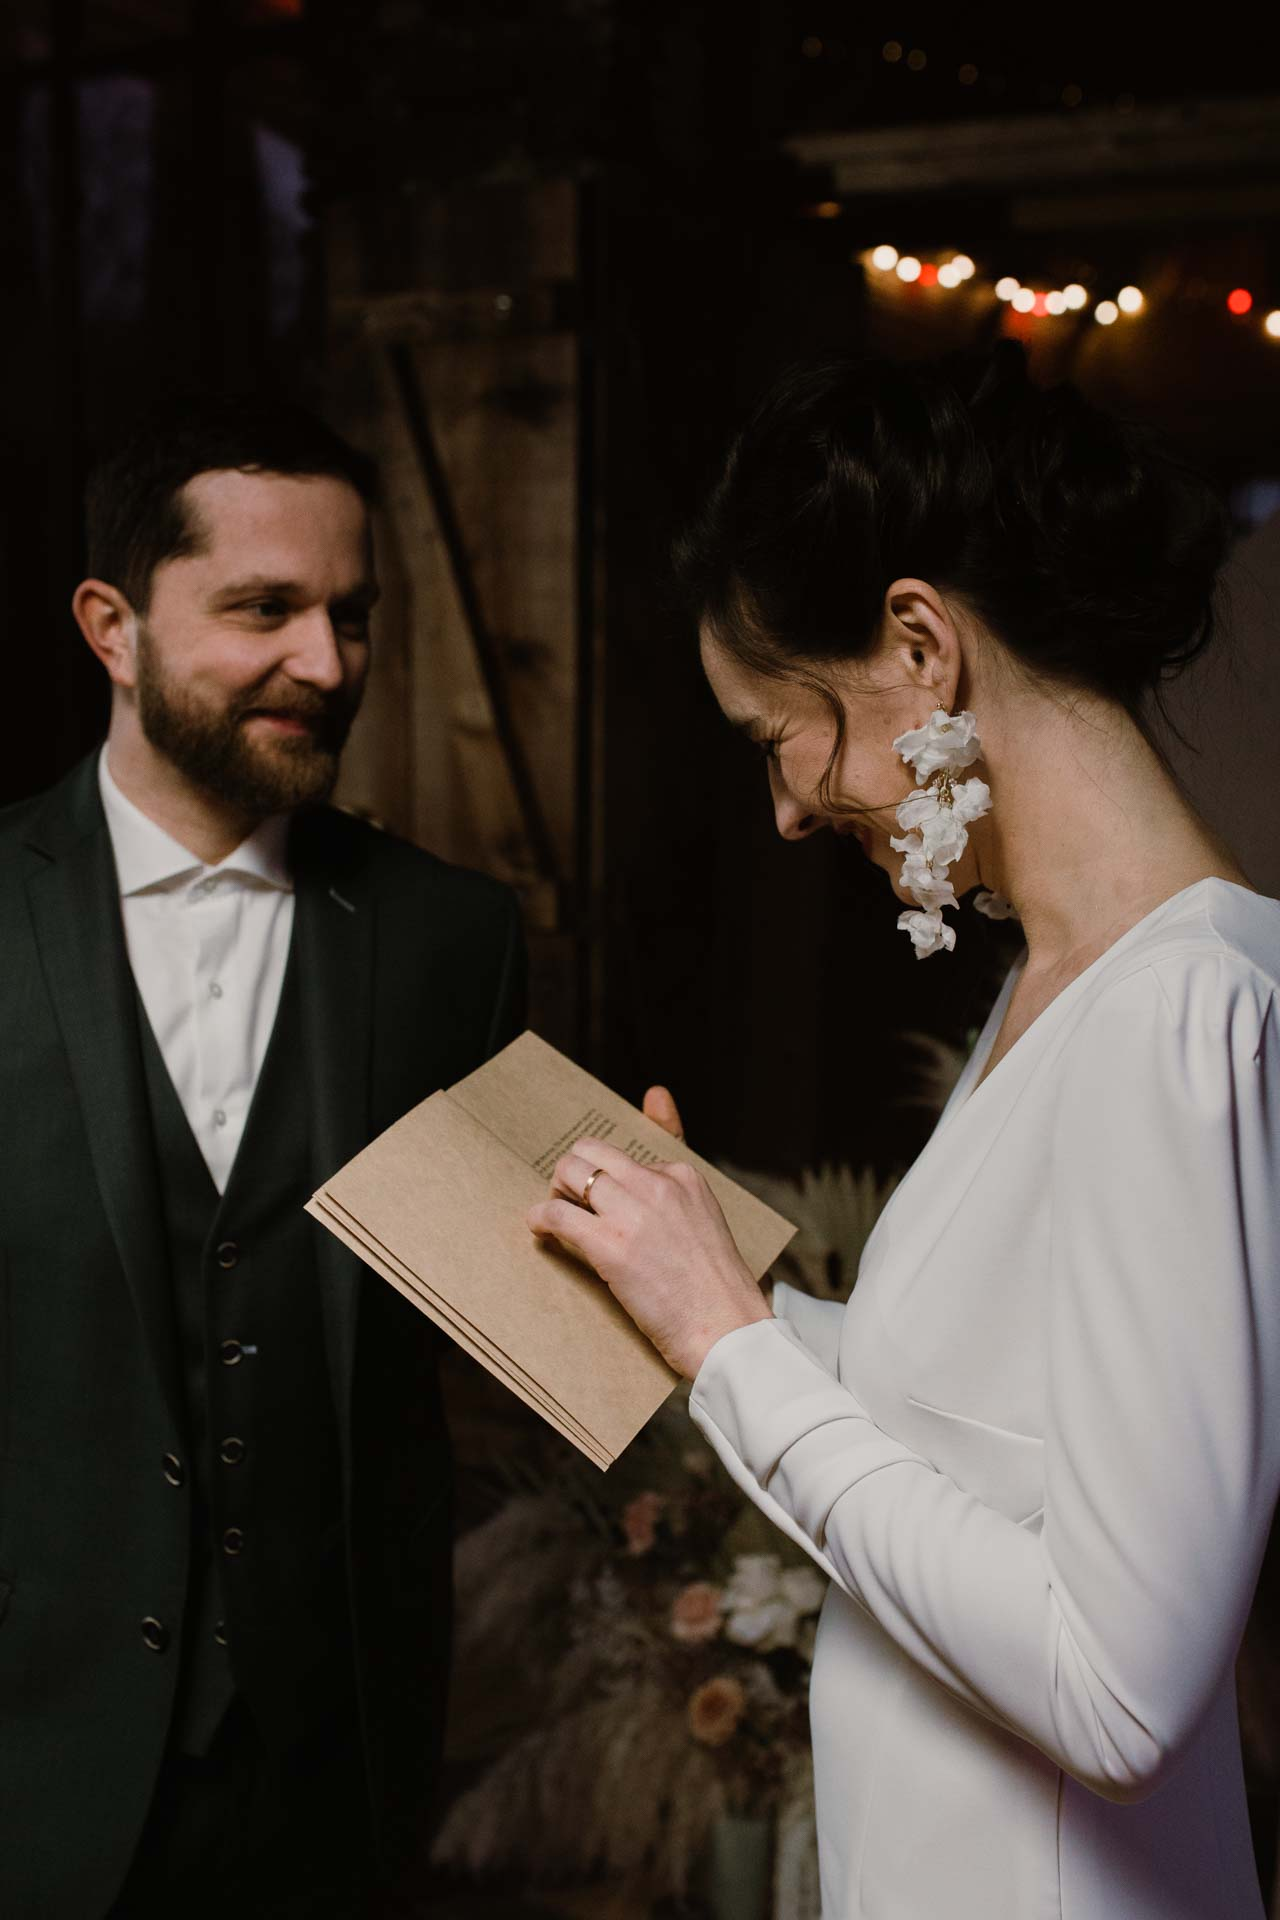 mariage simple poetique voeux de mariage